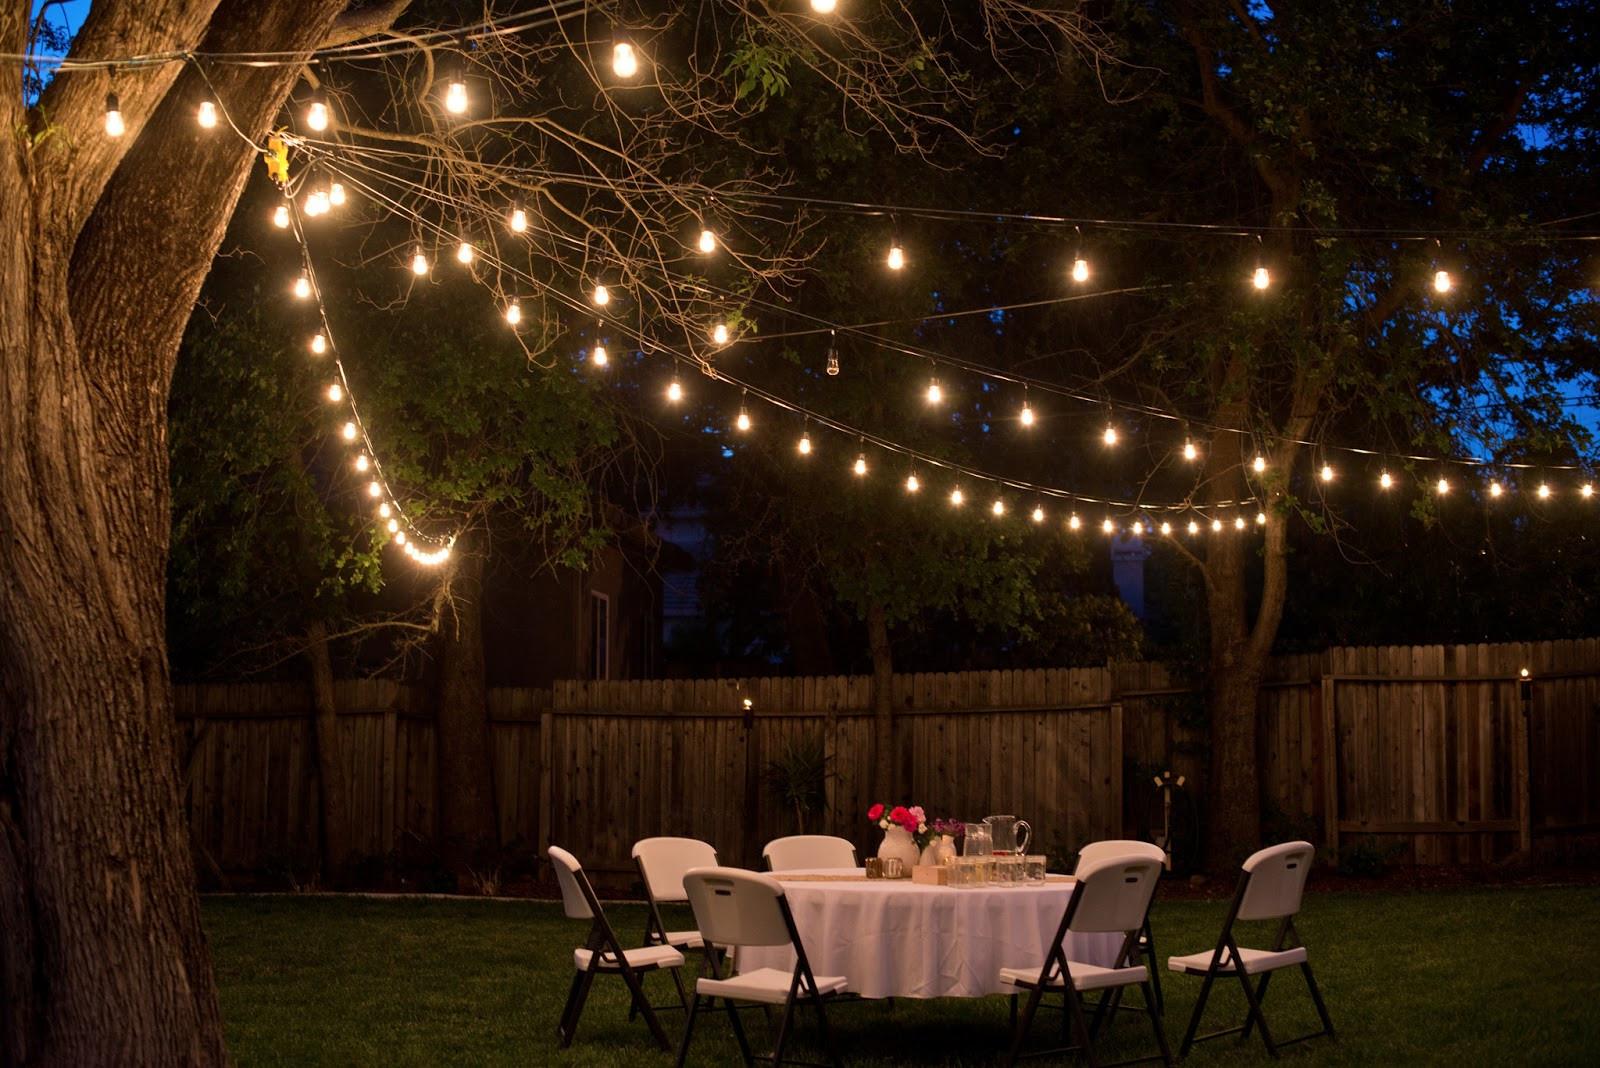 Backyard Party Ideas Lighting  Domestic Fashionista Backyard Anniversary Dinner Party